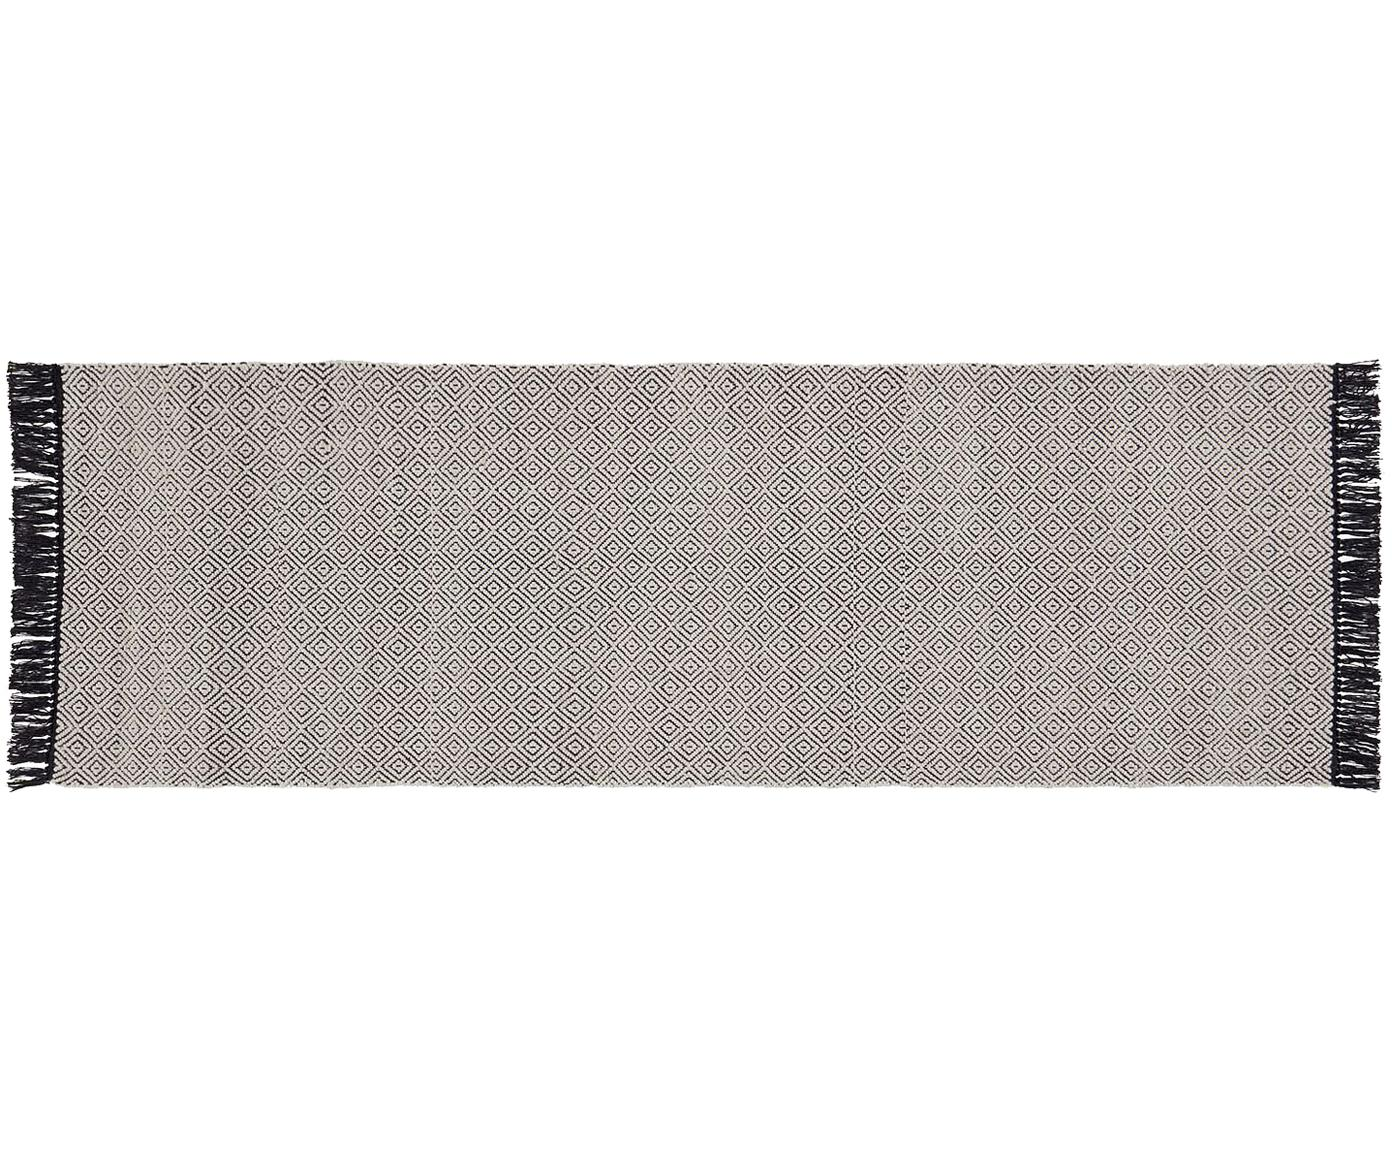 Passatoia Todos, 40% cotone, 30% lana, 30% poliestere, Greige, Larg. 80 x Lung. 250 cm